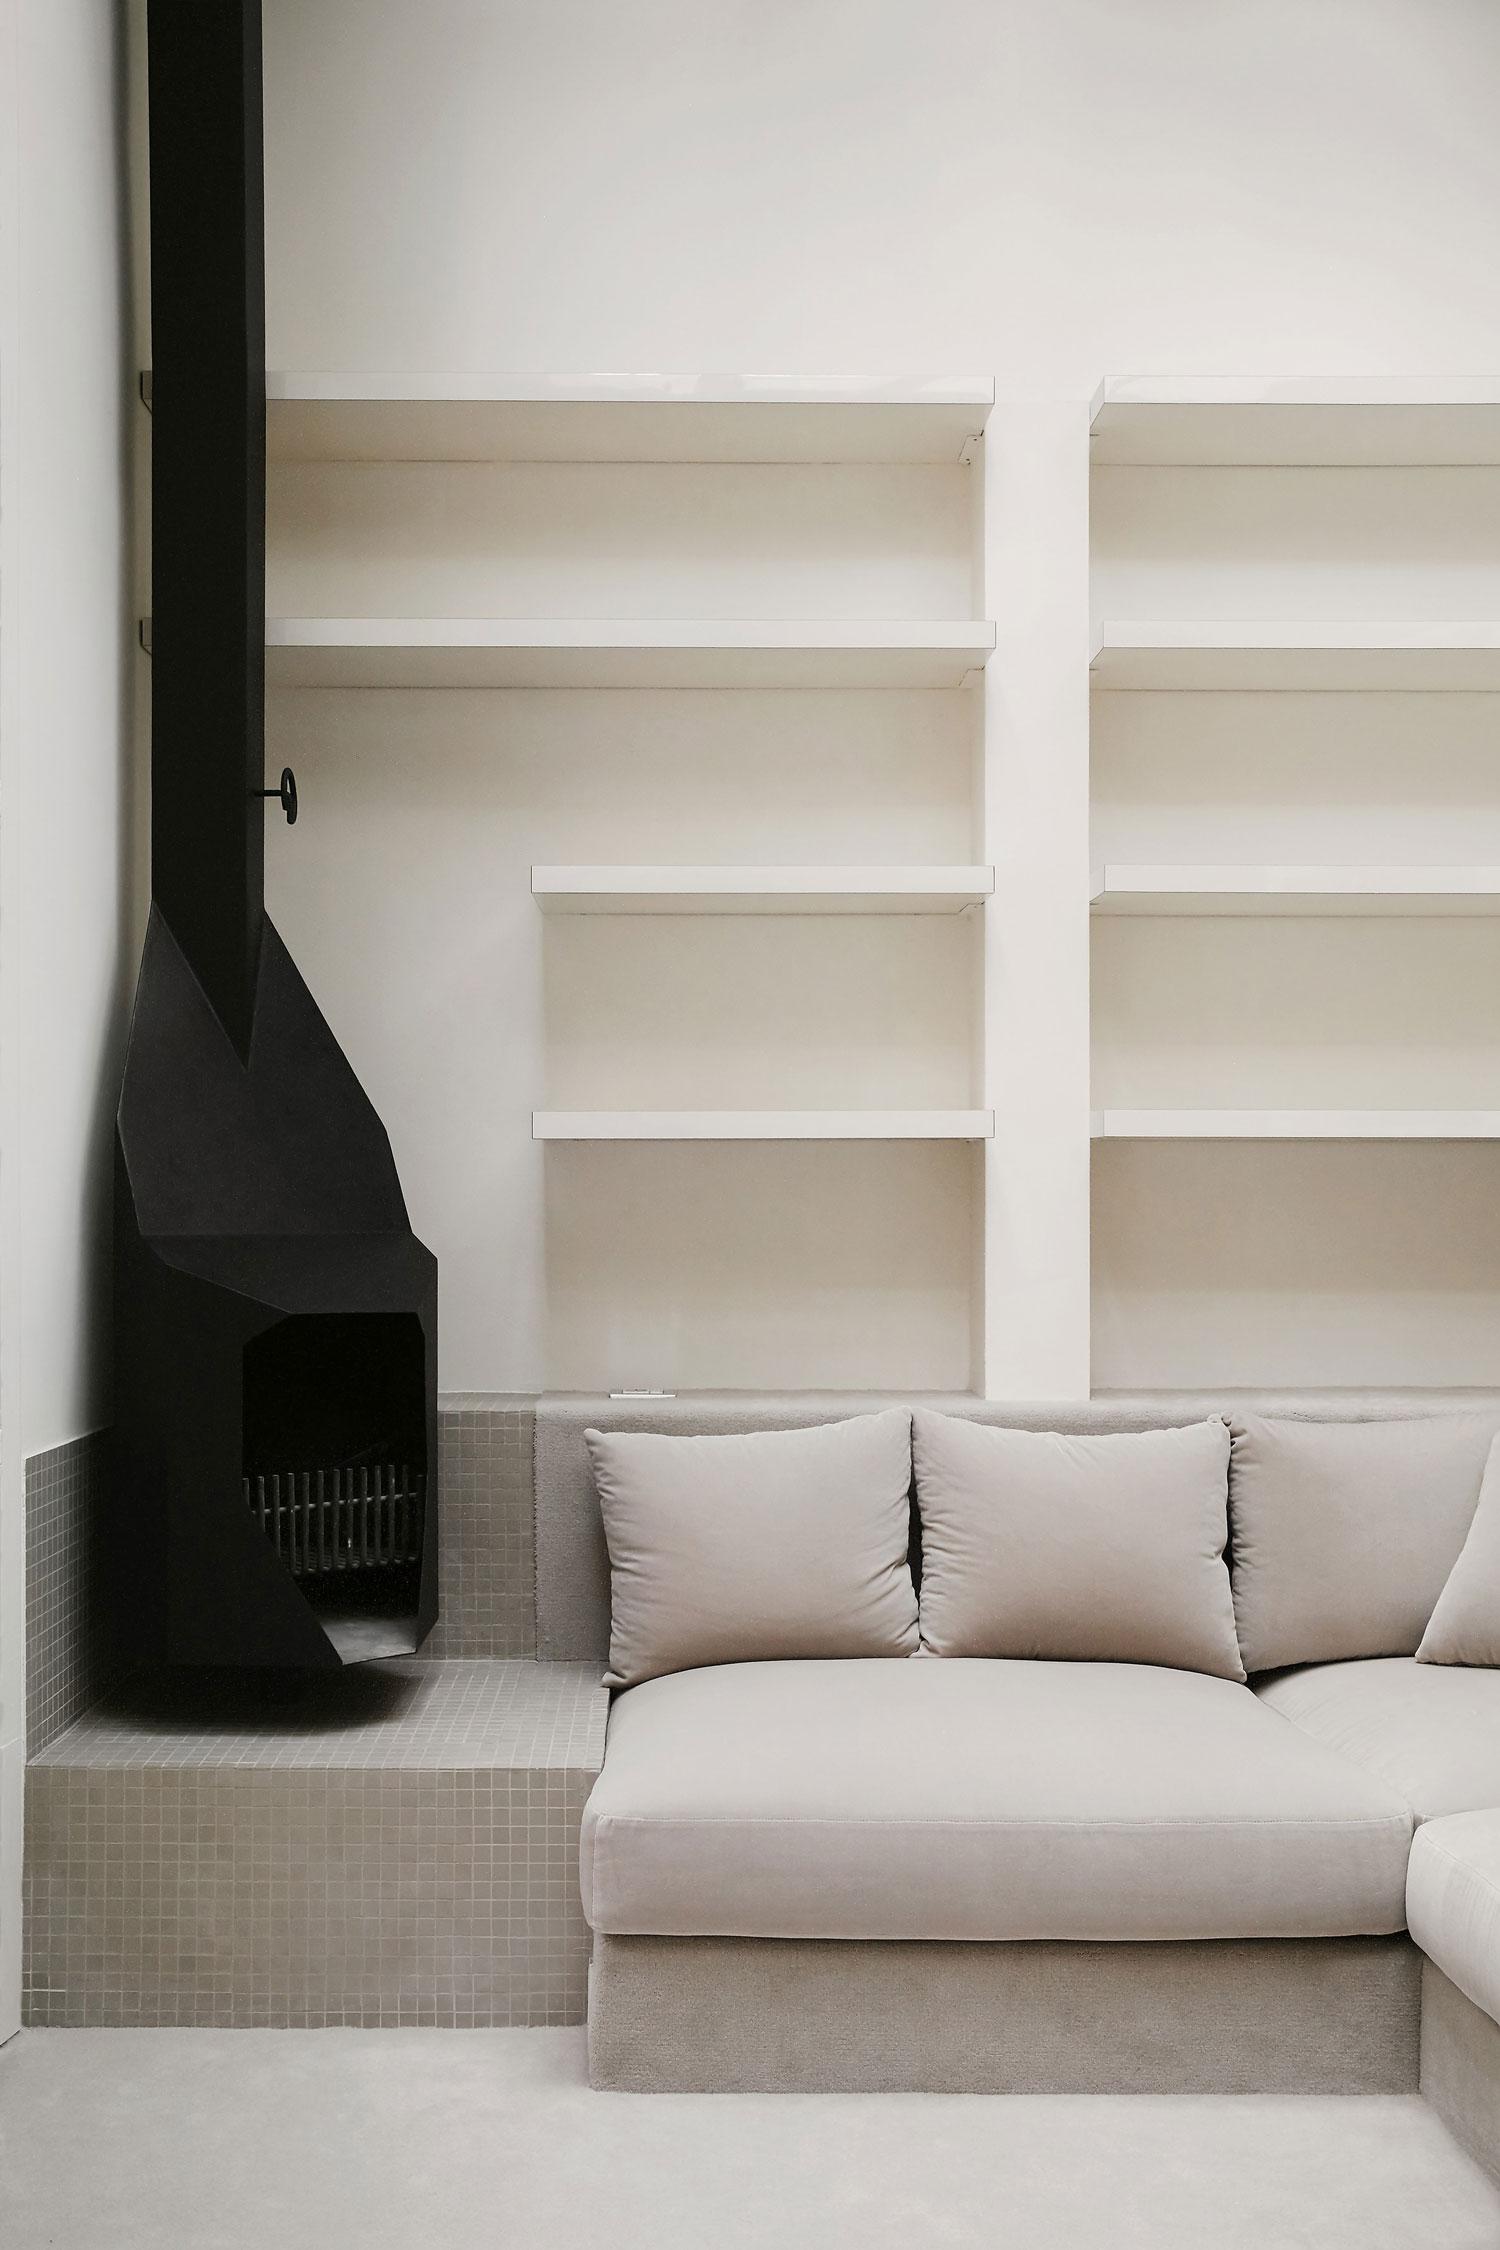 Apartmenton Reig I Bonet Street, Barcelona by Arquitectura-G | Yellowtrace